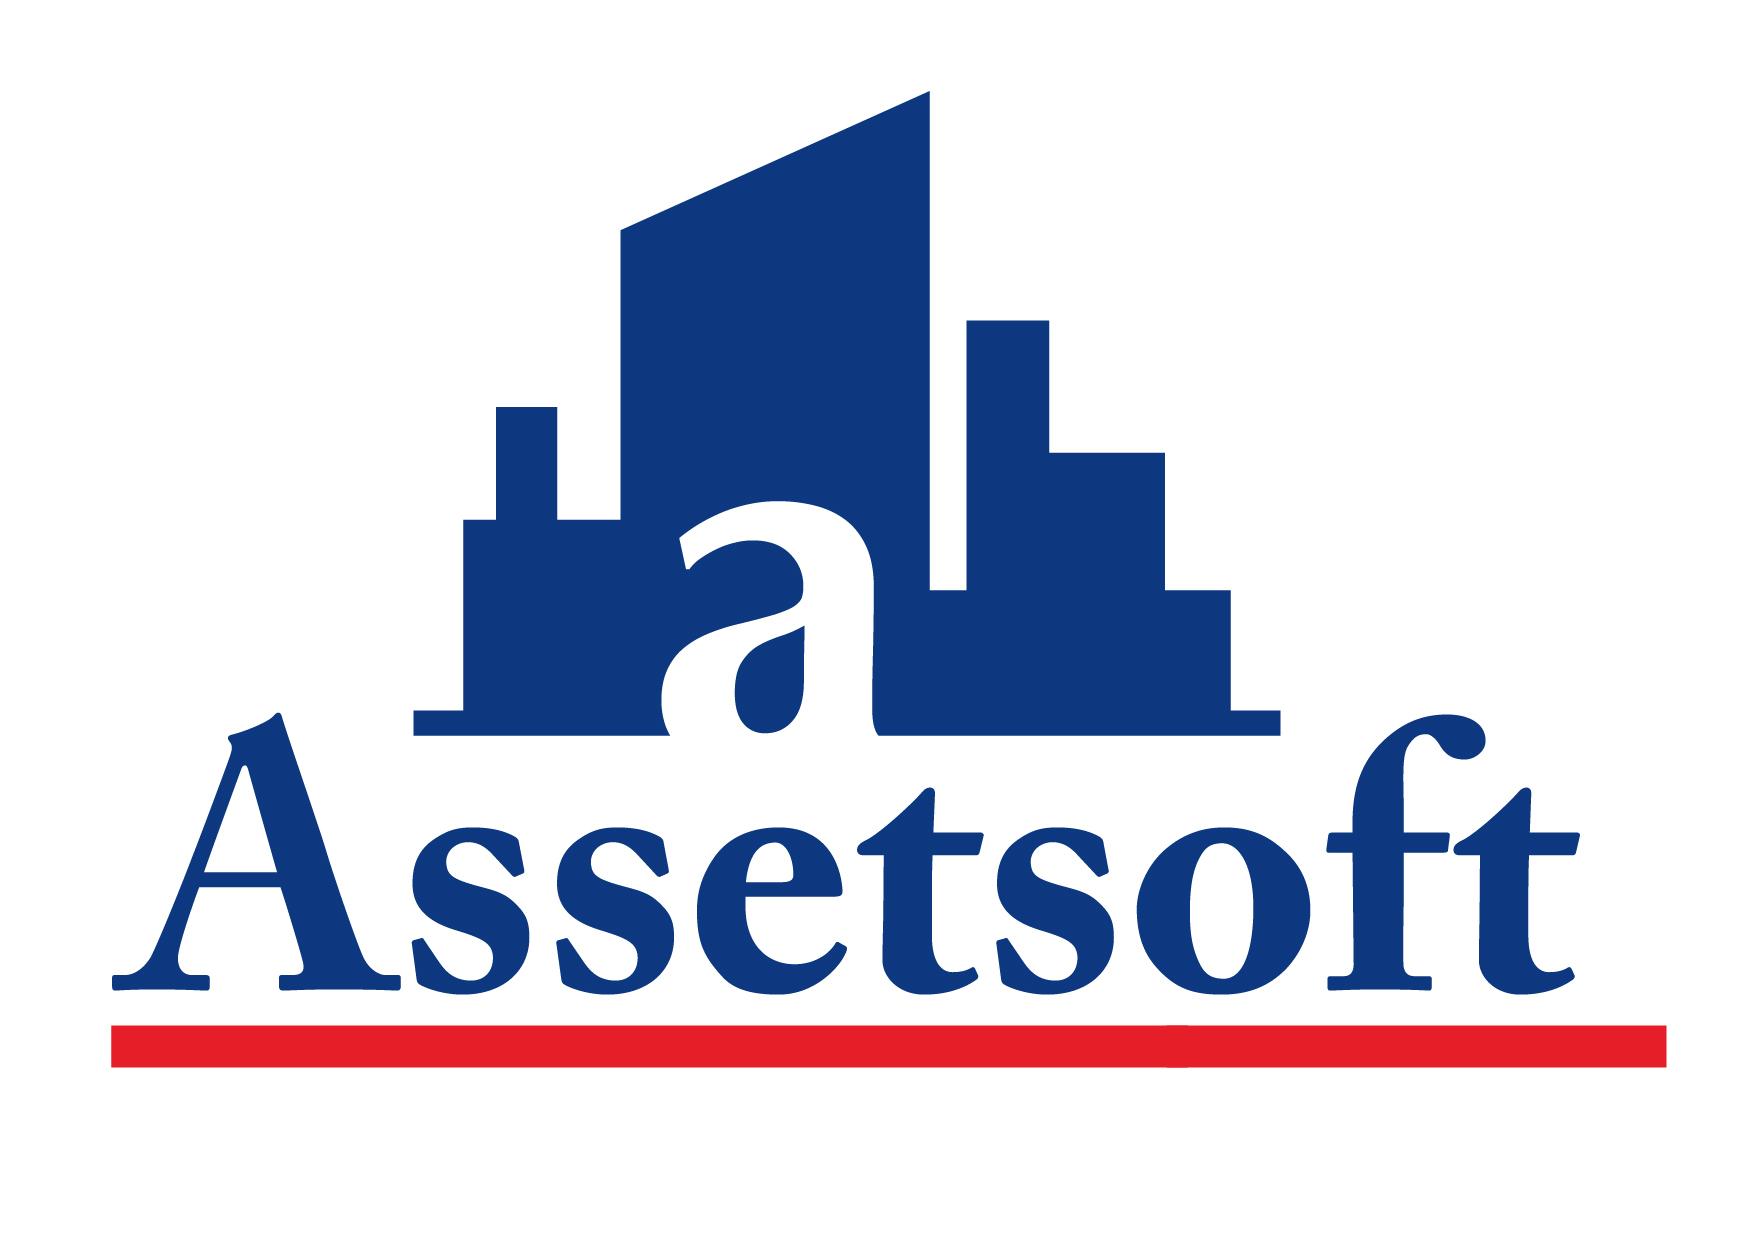 assetsoftlogocpmmay112021.jpg